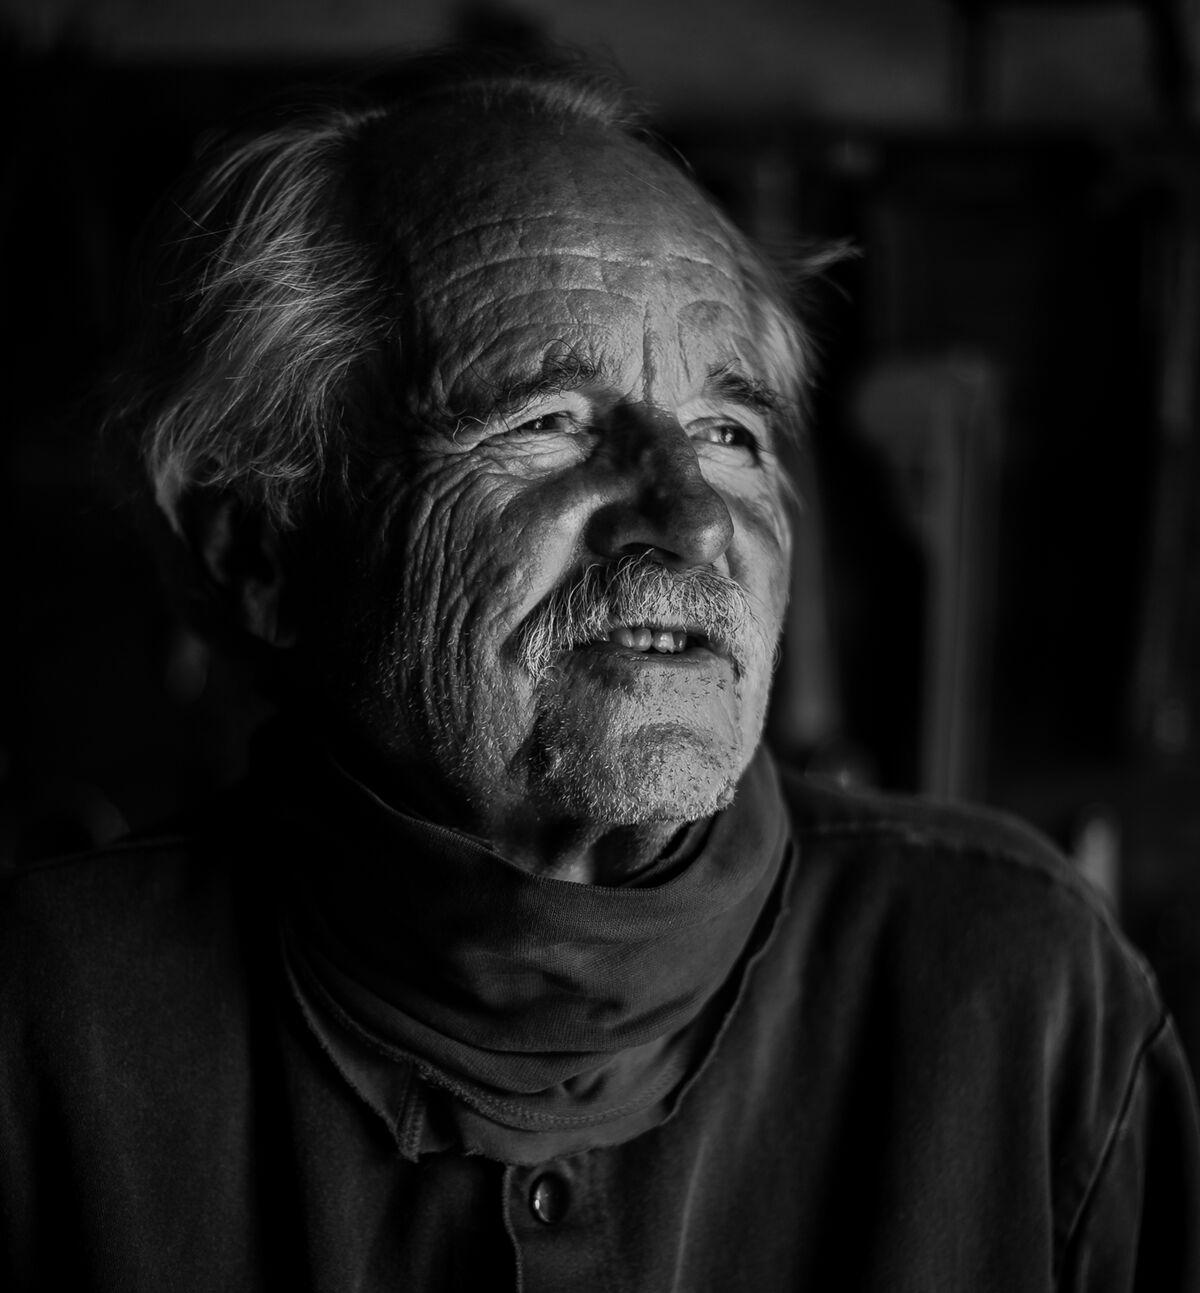 Wendell Dayton. Photo by Bryan David Hall. Courtesy of the artist.